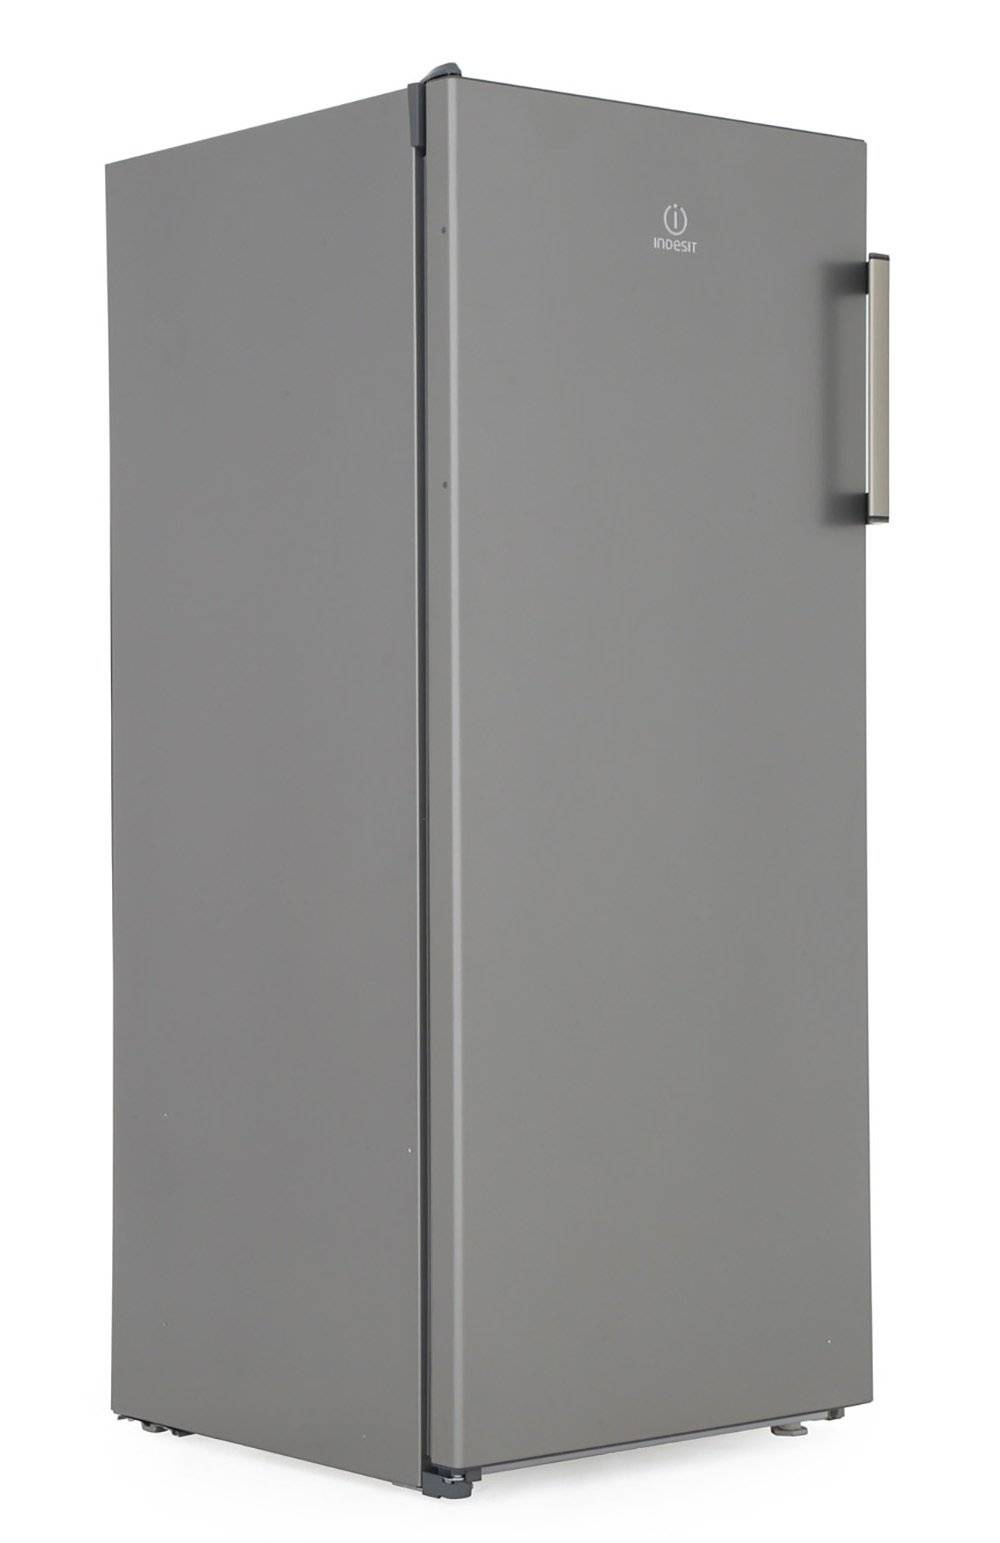 Indesit UI4 1 S UK.1.1 Static Tall Freezer - Silver